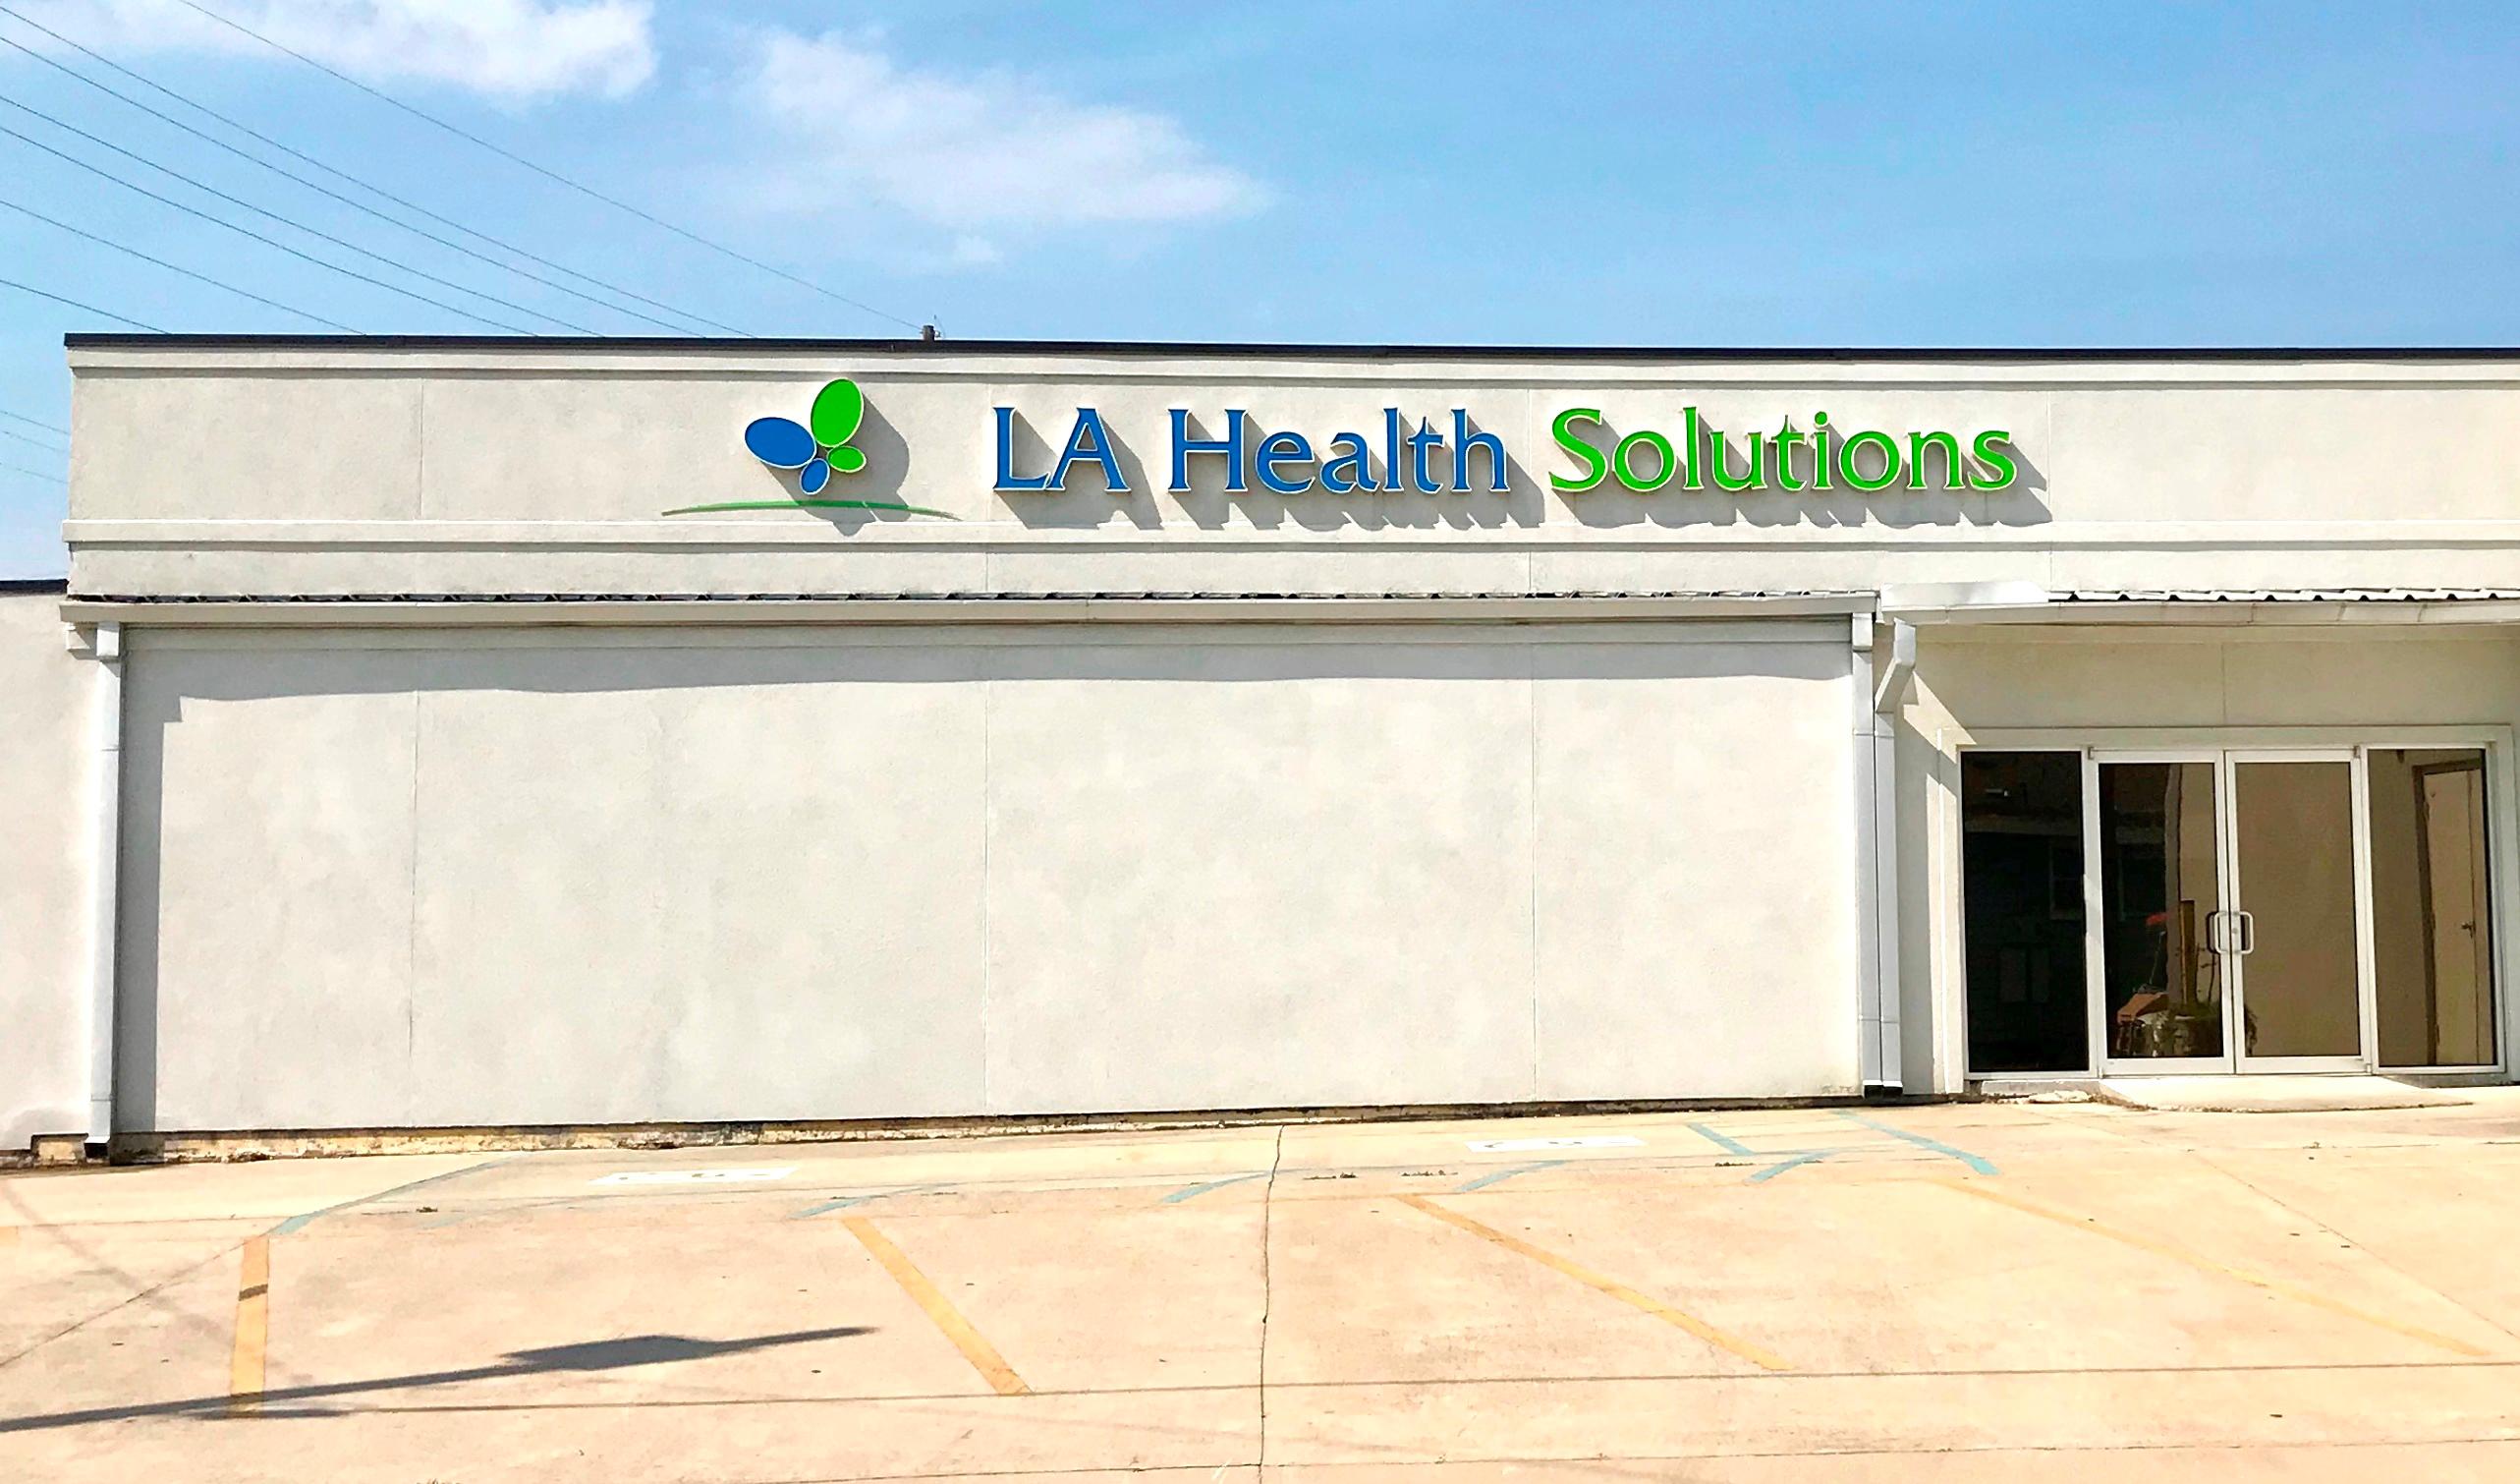 la health solutions location